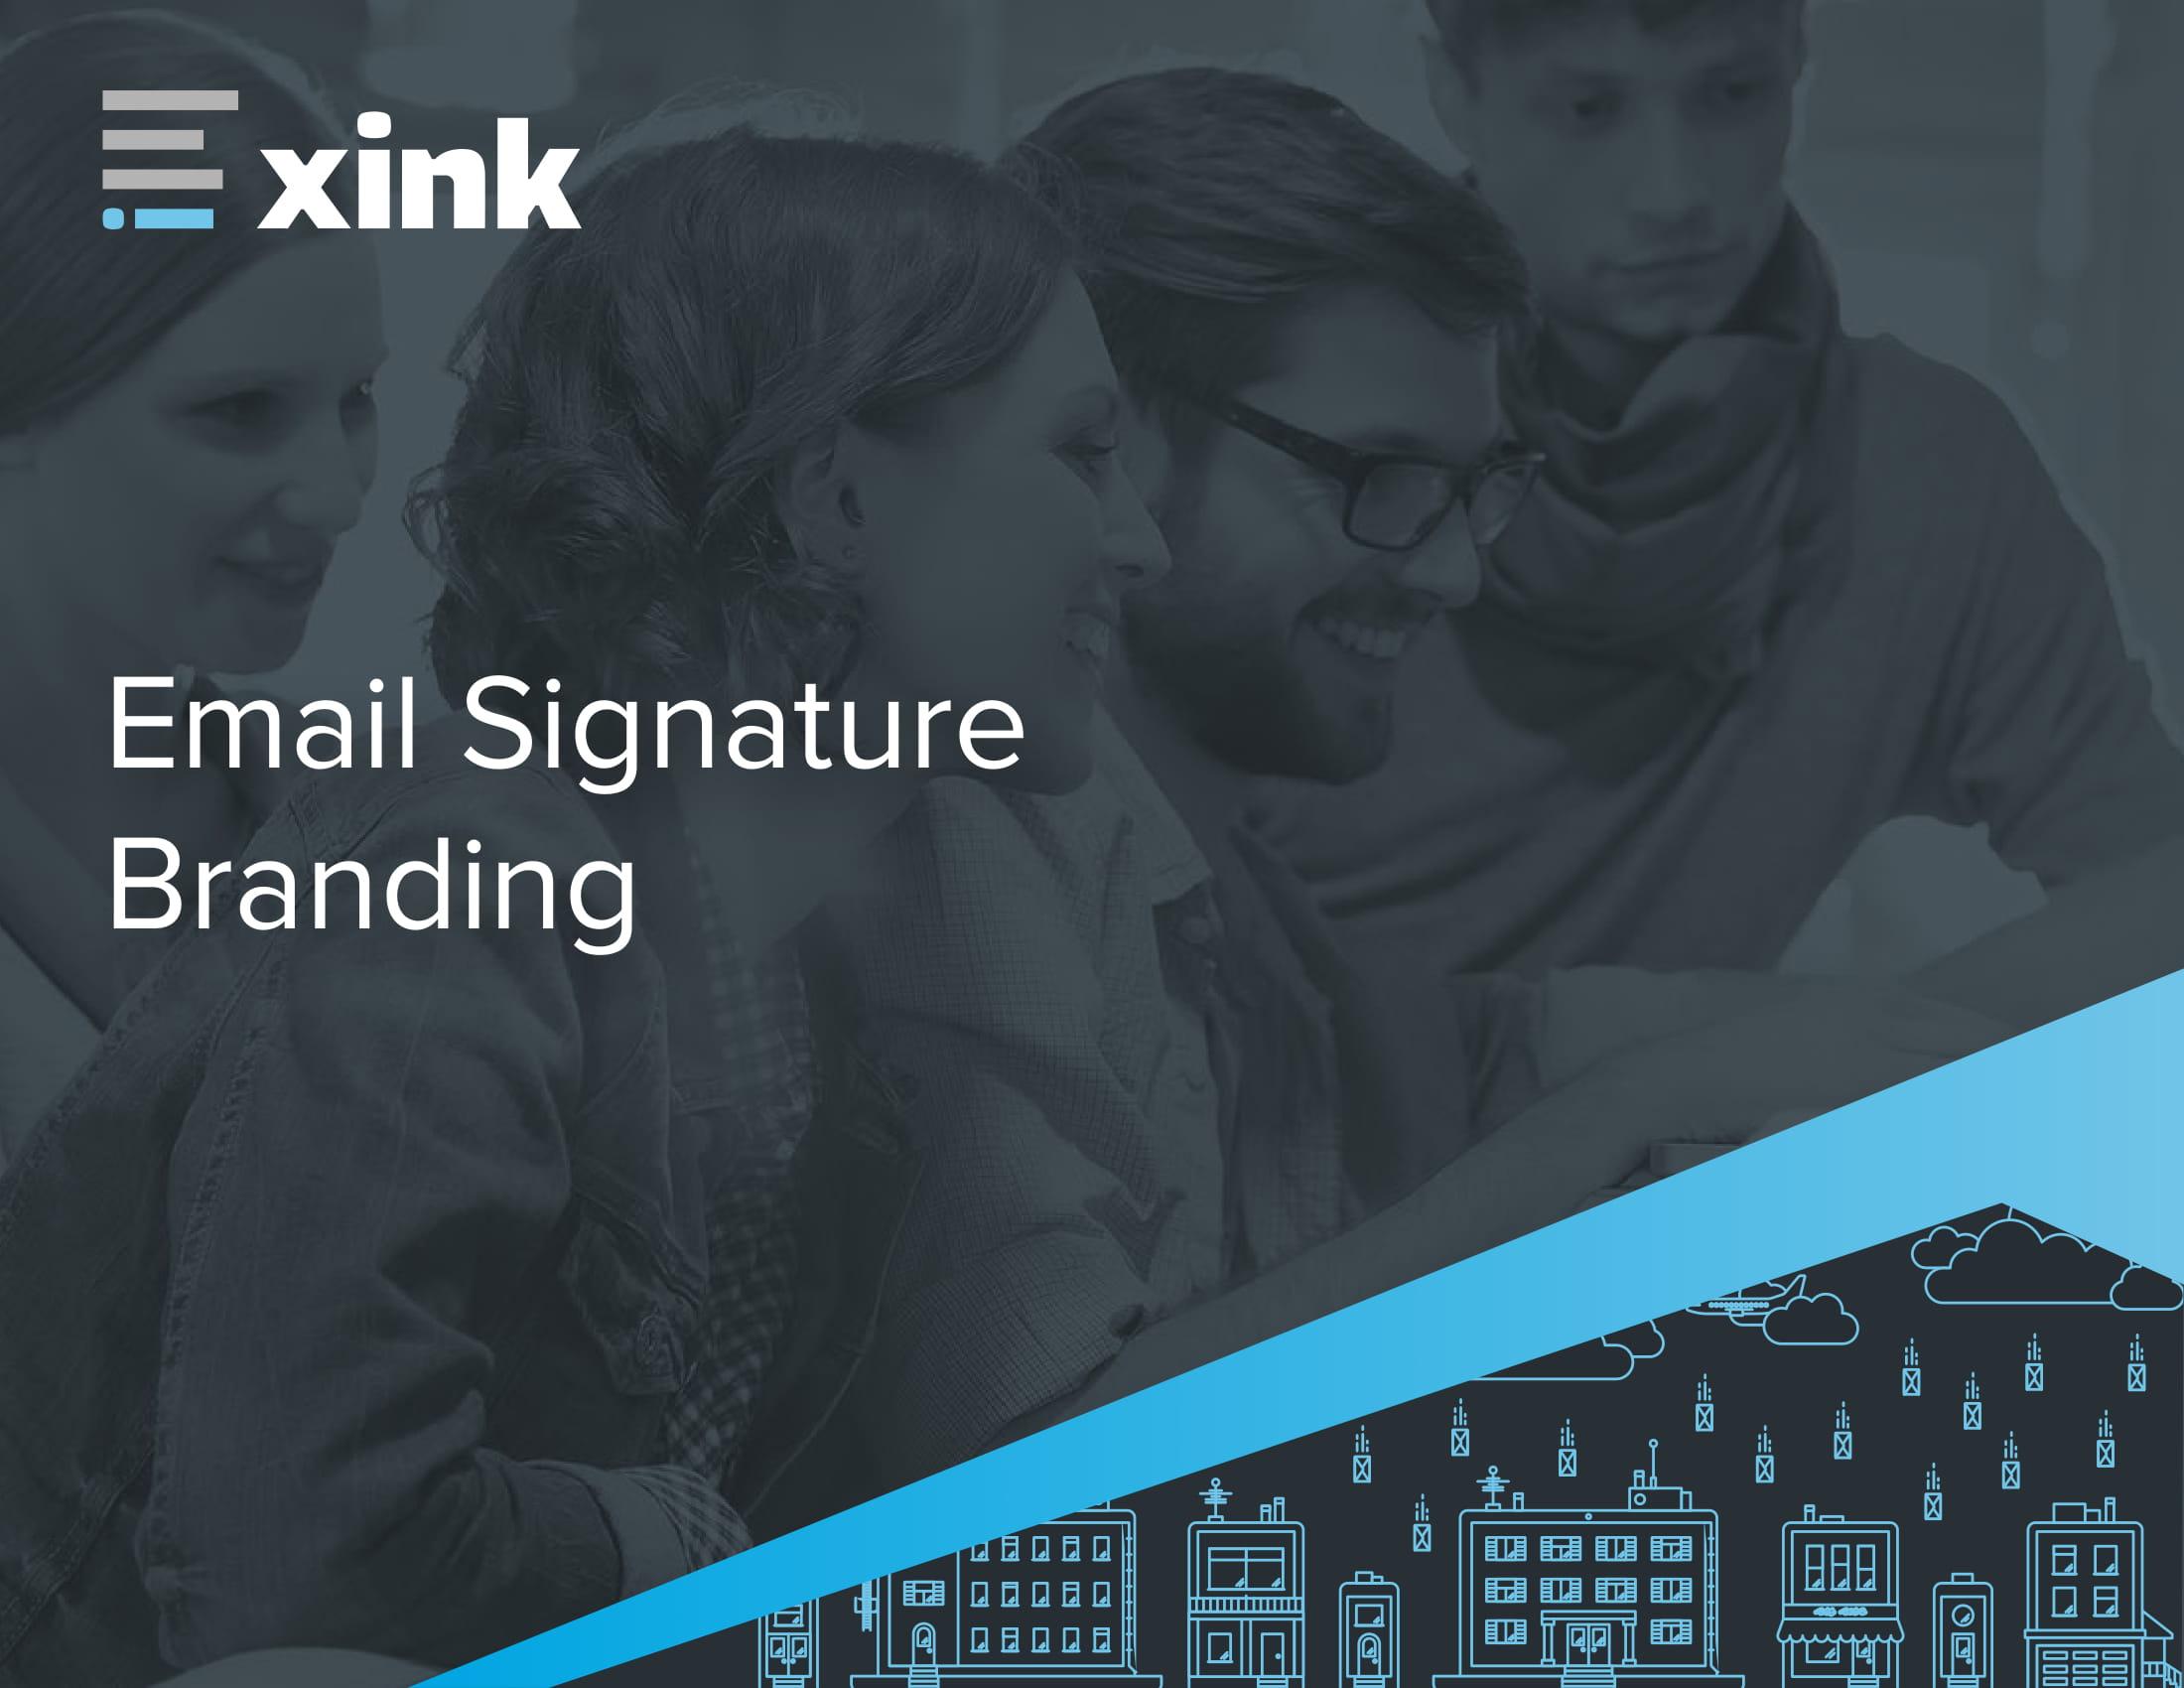 email signature branding example 01